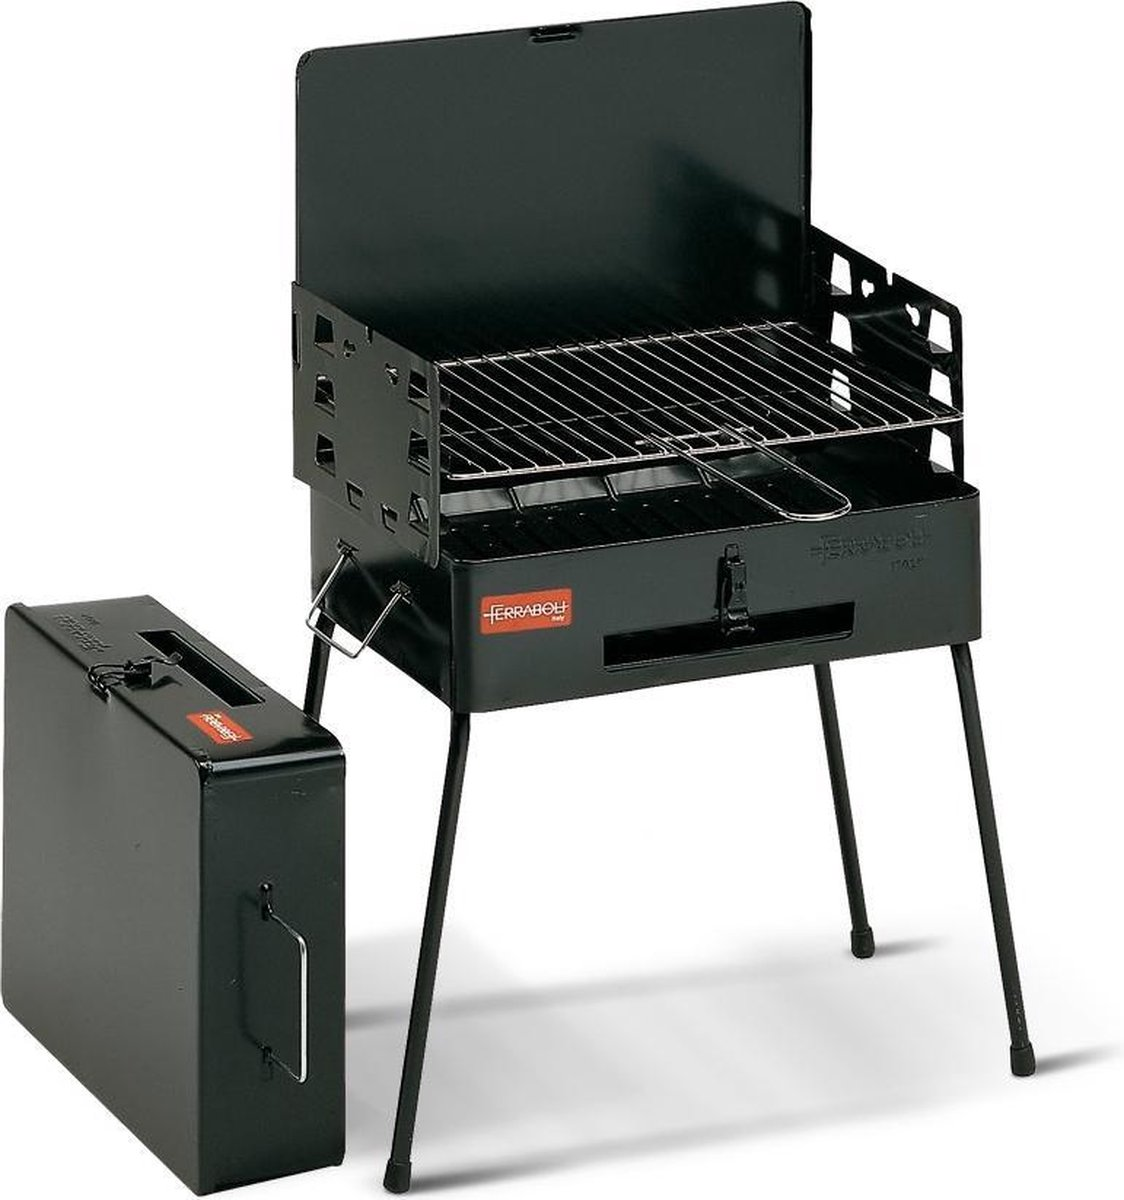 Ferraboli Picnic Houtskoolbarbecue - Zwart